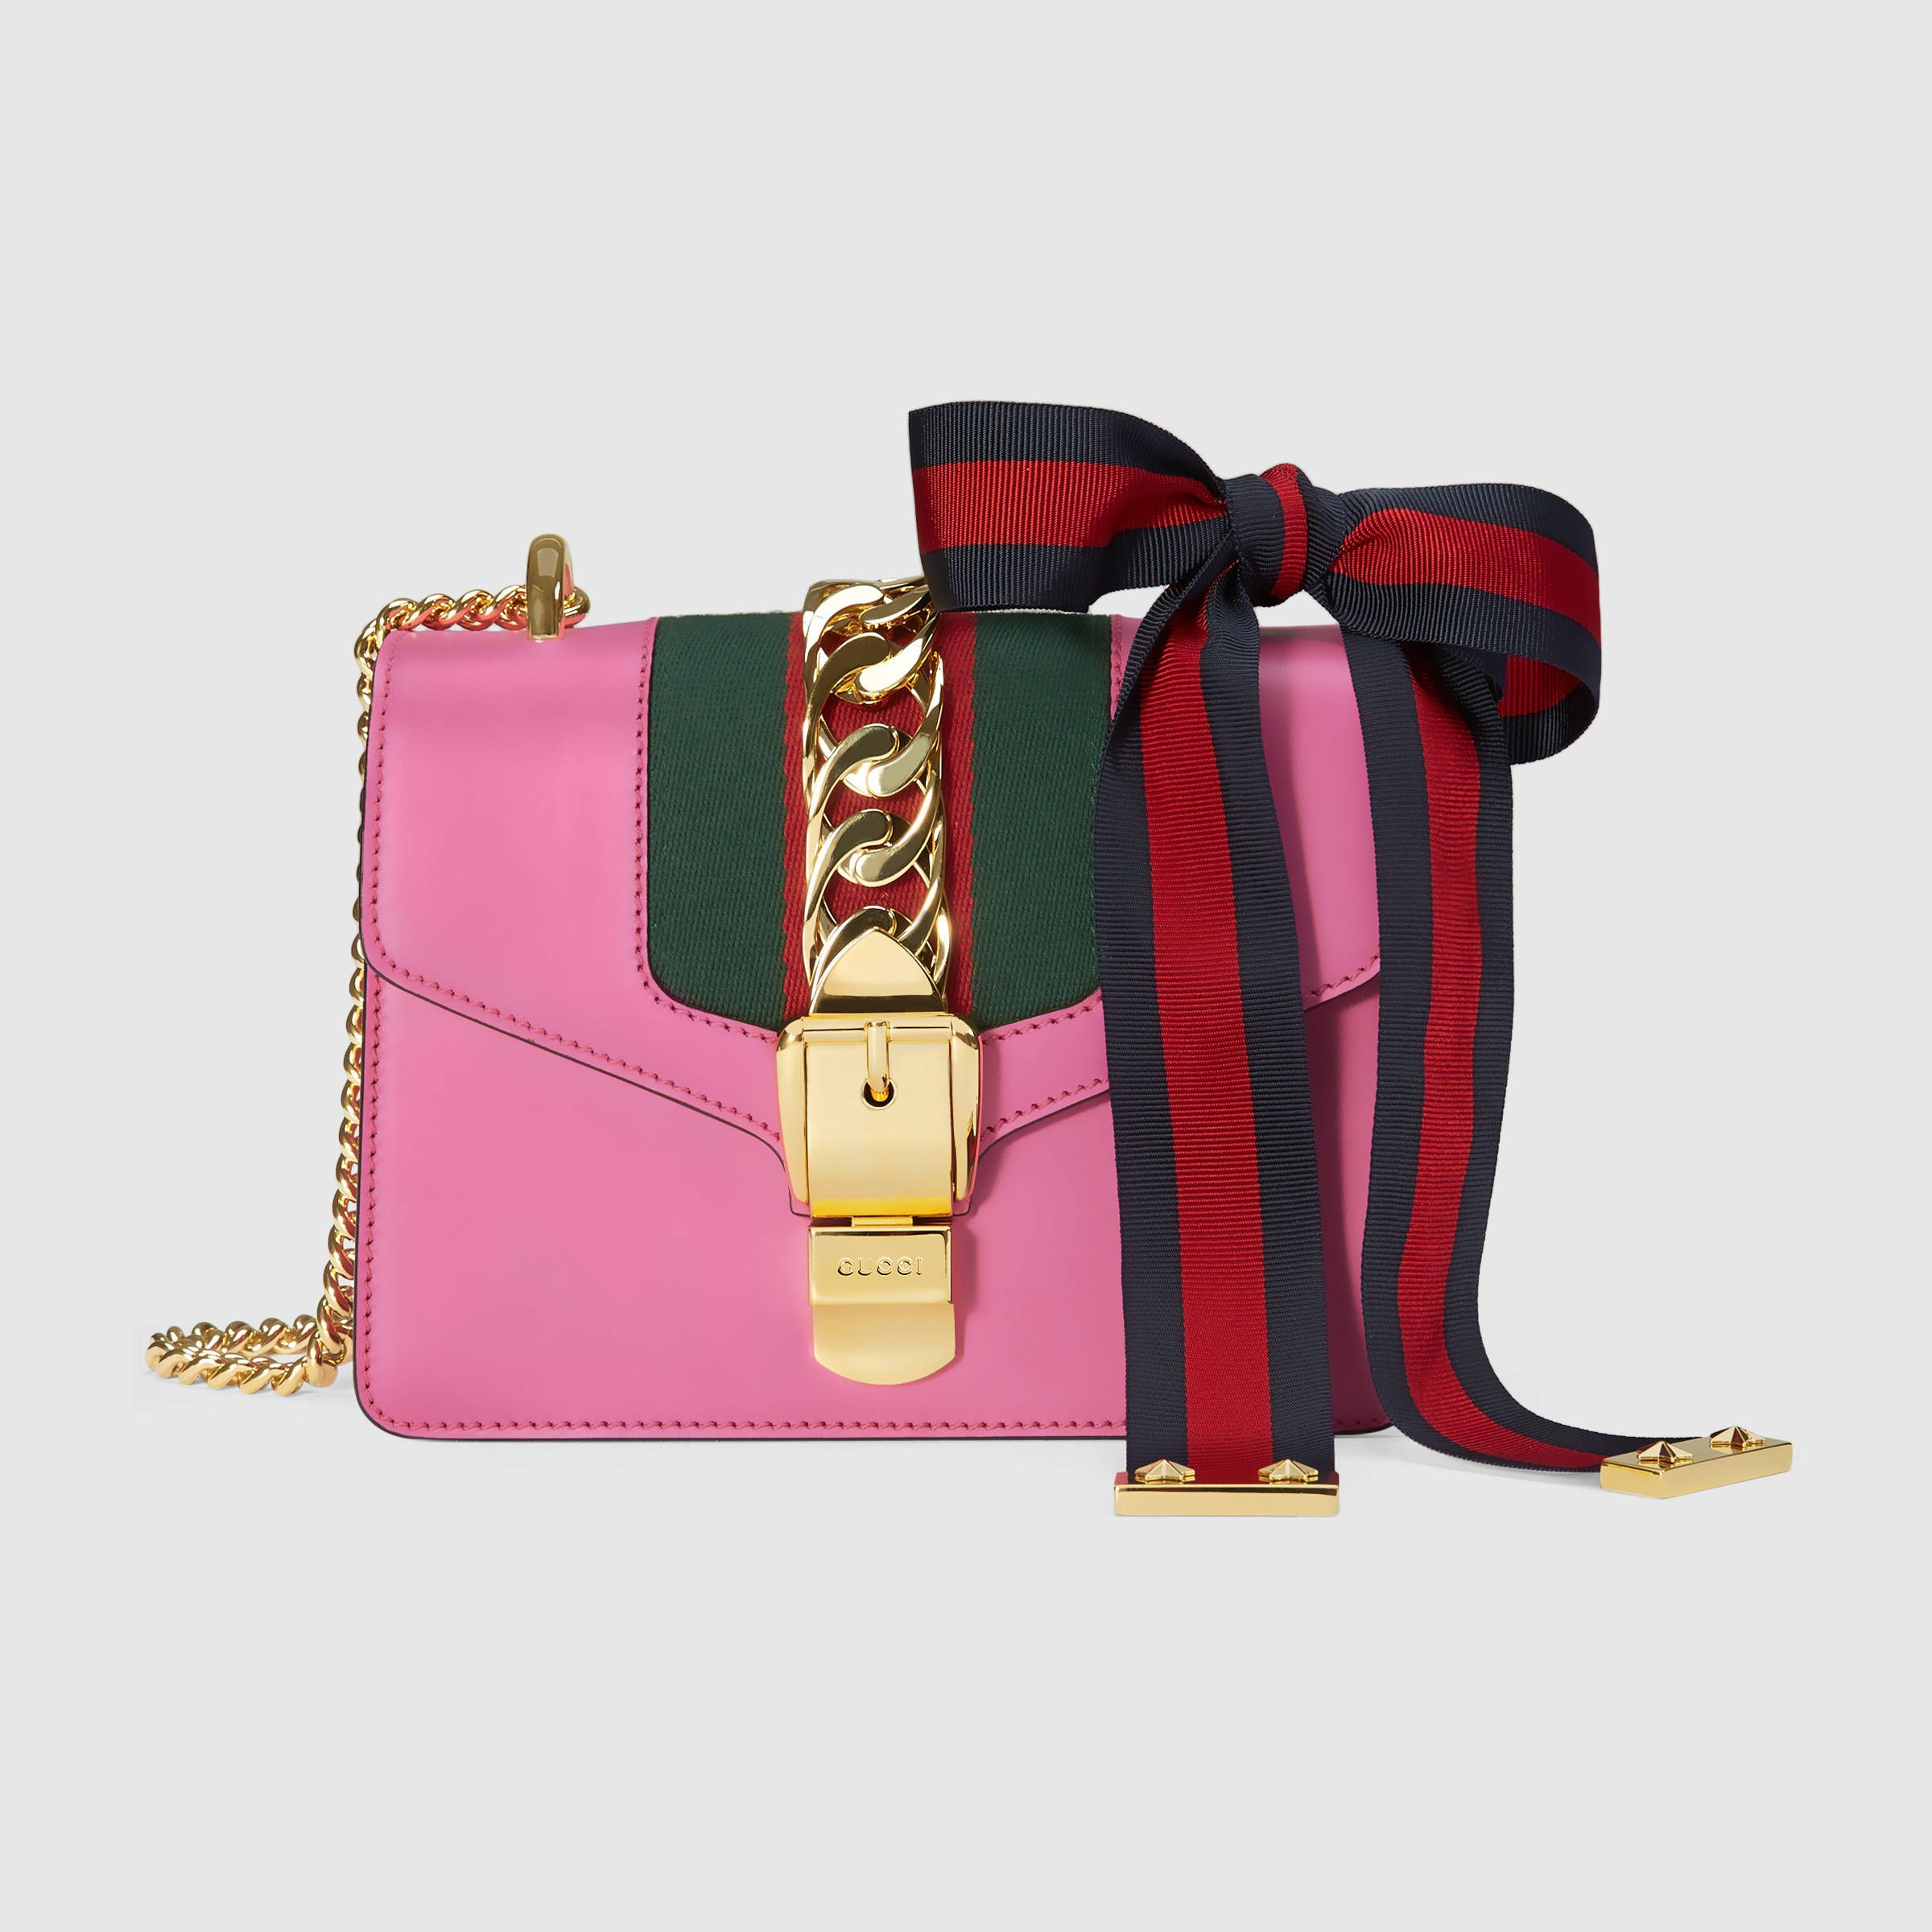 Gucci Donna - Mini borsa Sylvie in pelle con catena - 431666CVLEG5660 6a691d7bae8e